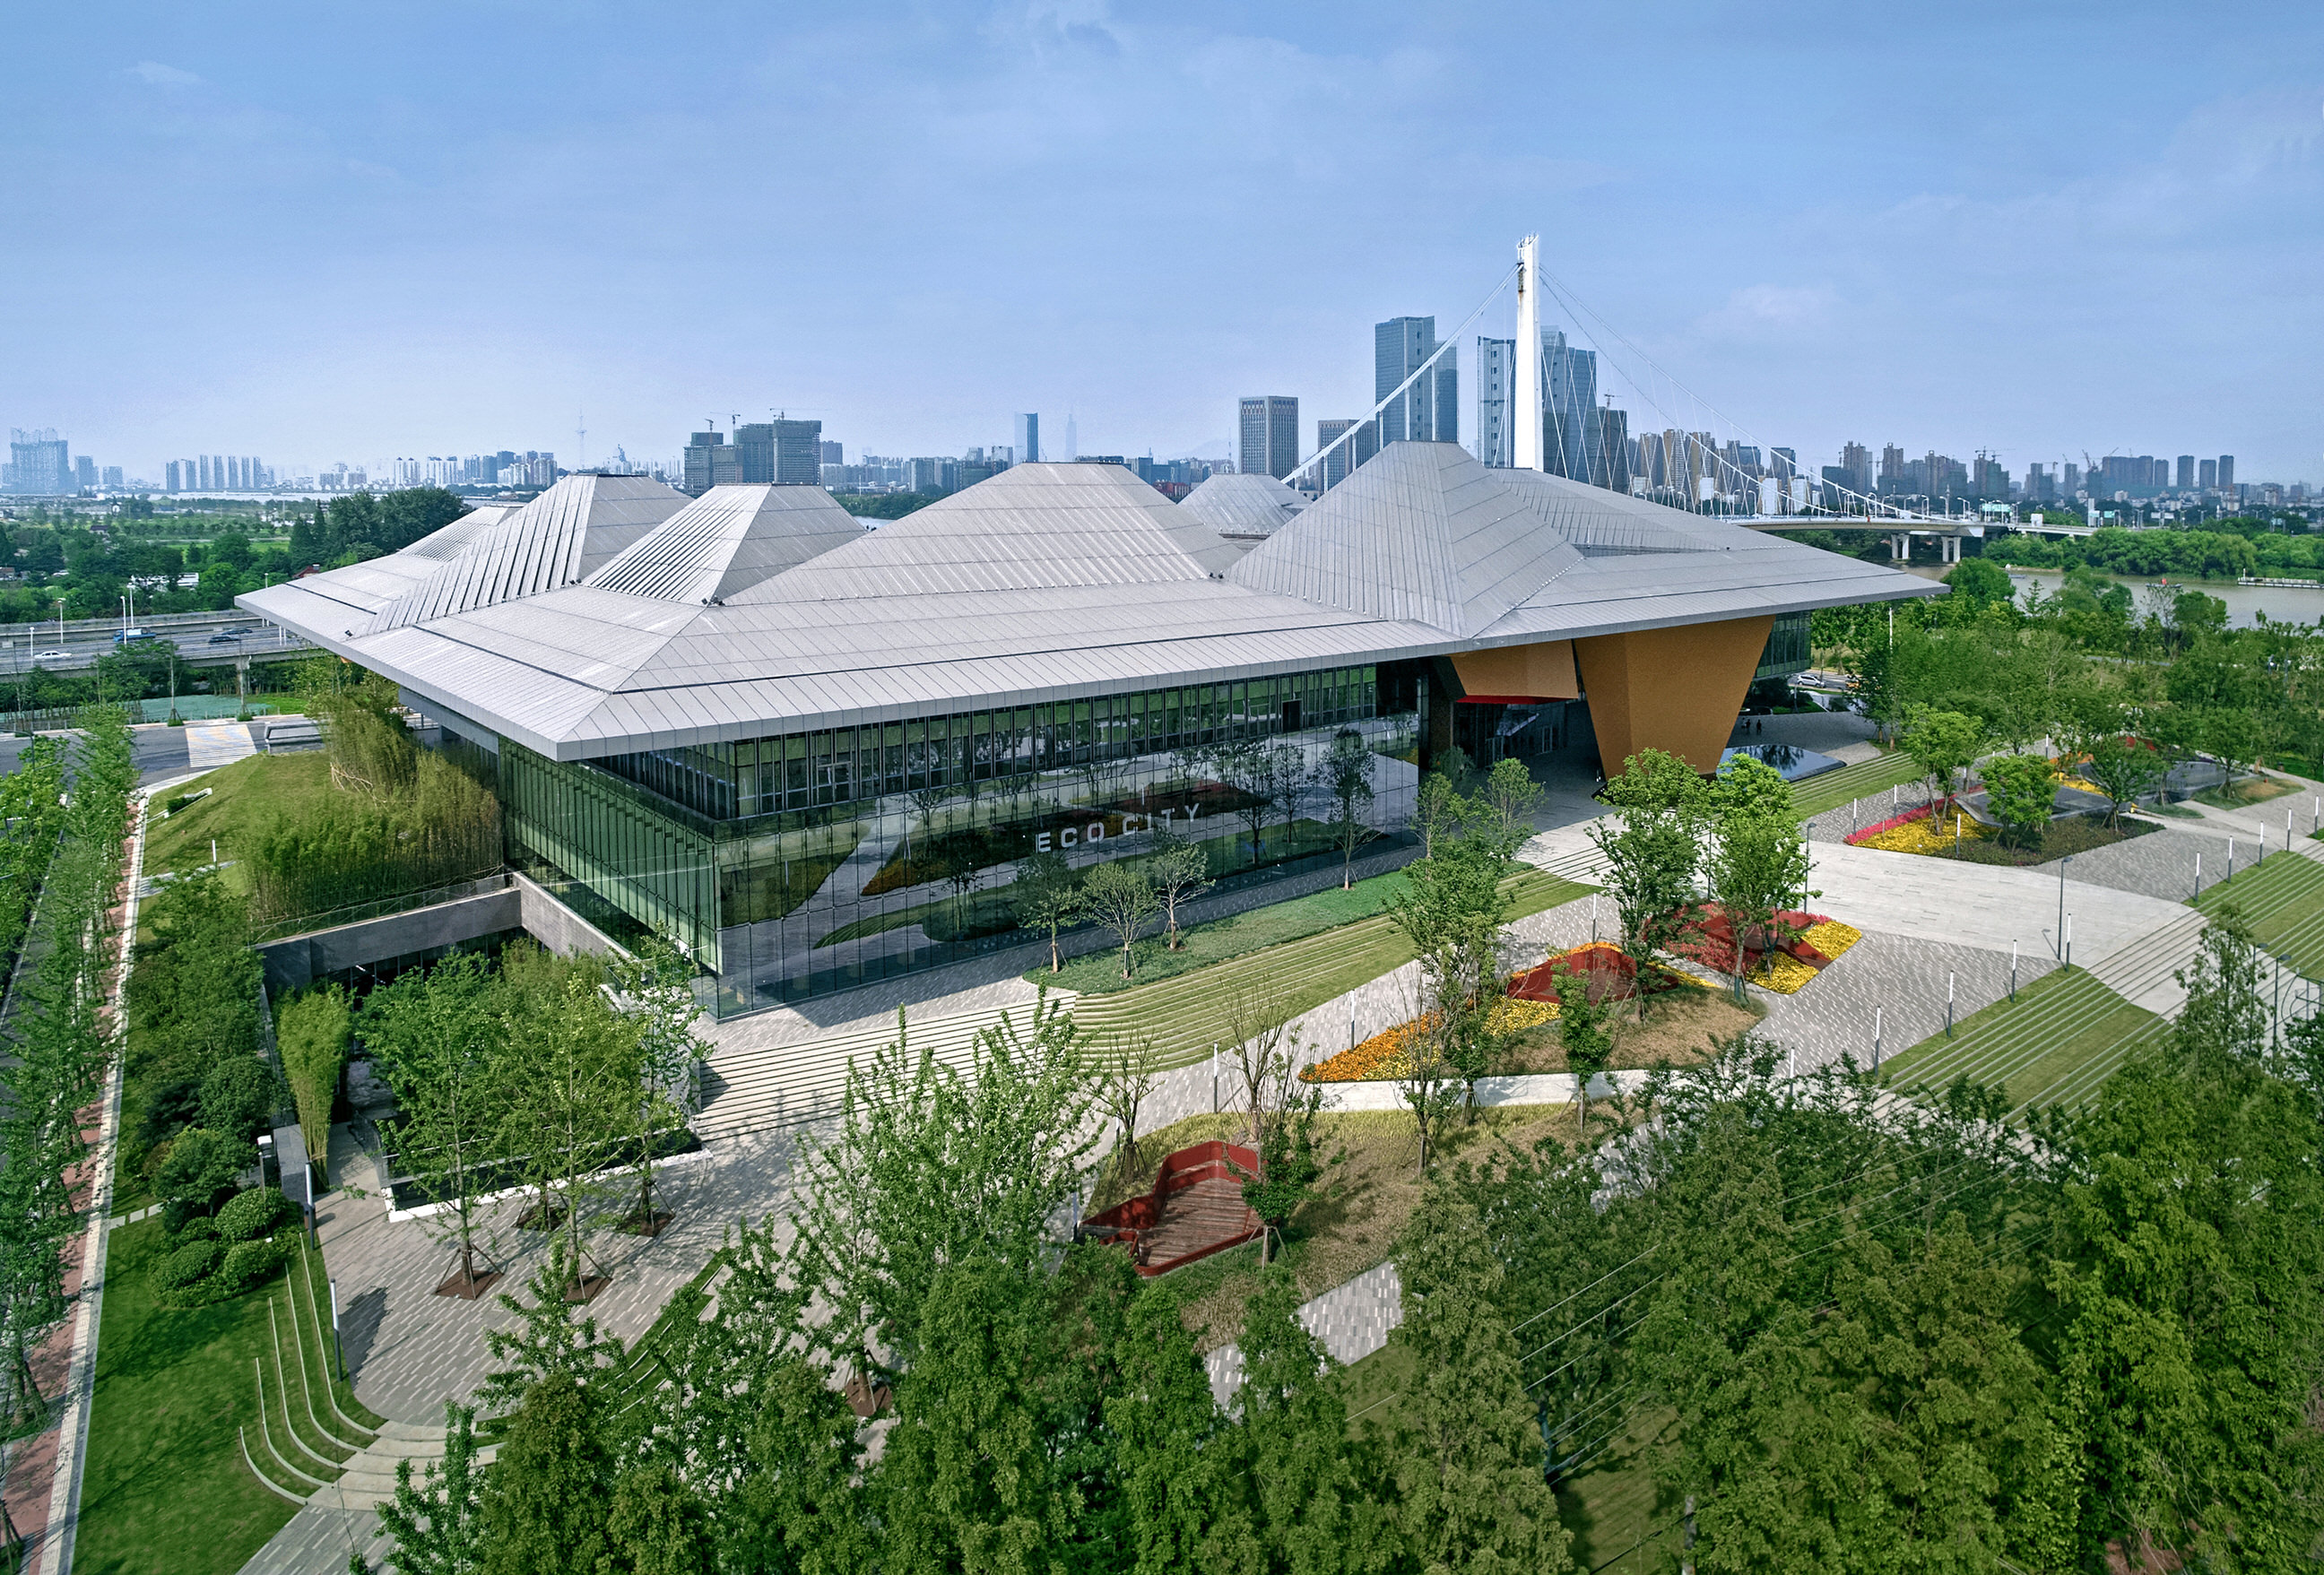 The Quot Tectonic Bravery Quot Of Nbbj S Nanjing Eco Tech